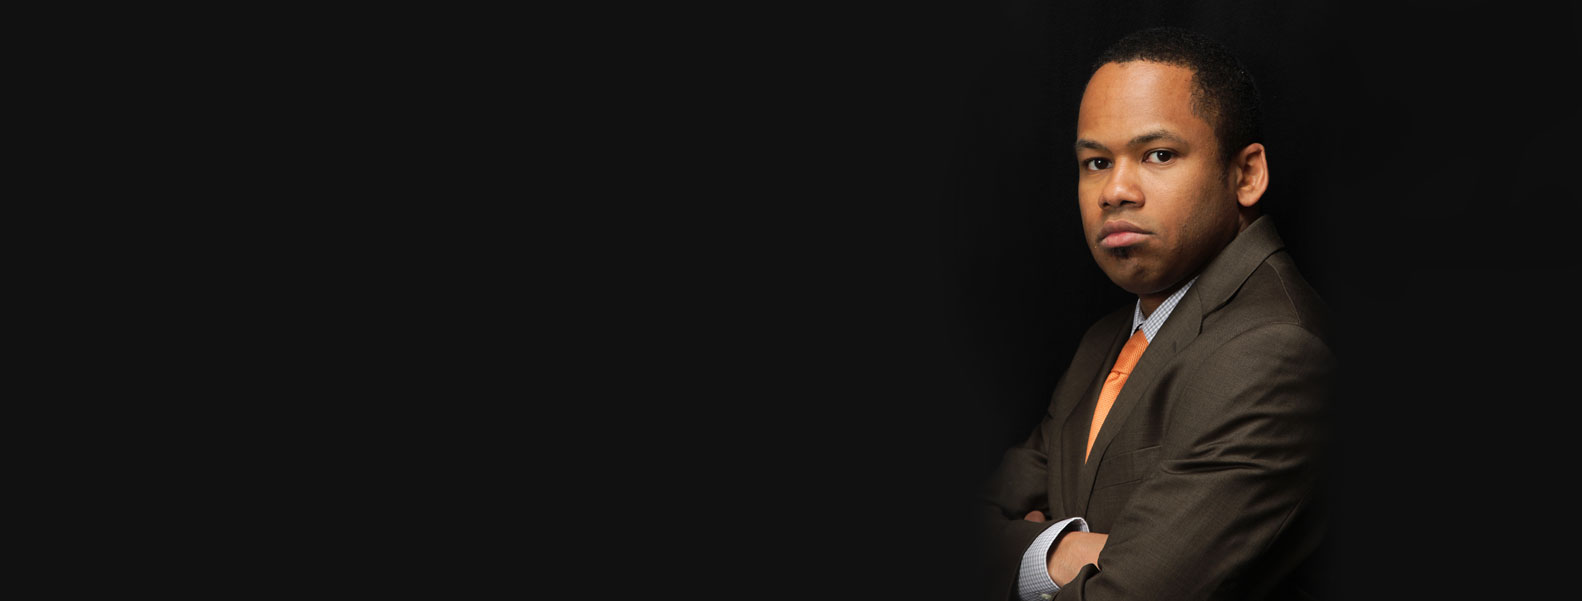 Tony De Los Santos - Milwaukee Lawyer